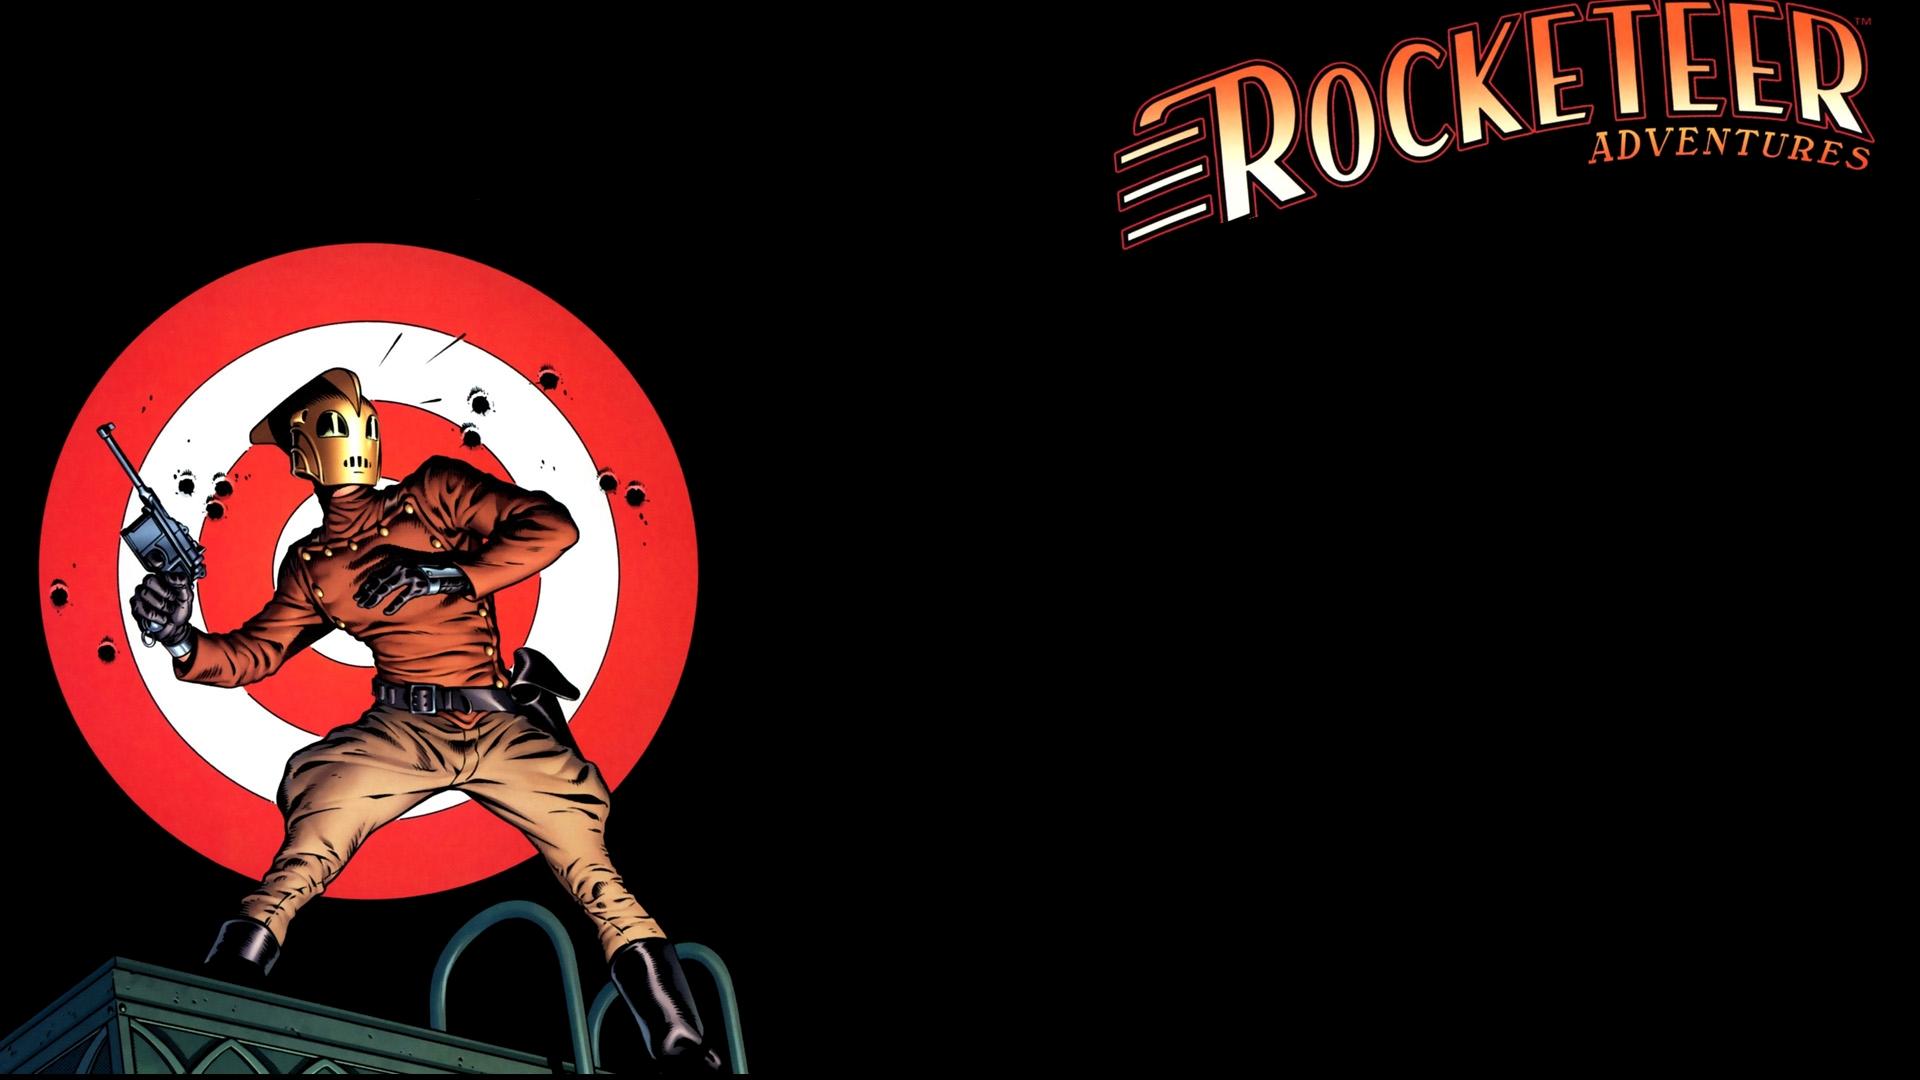 Rocketeer Hd Wallpaper Background Image 1920x1080 Id